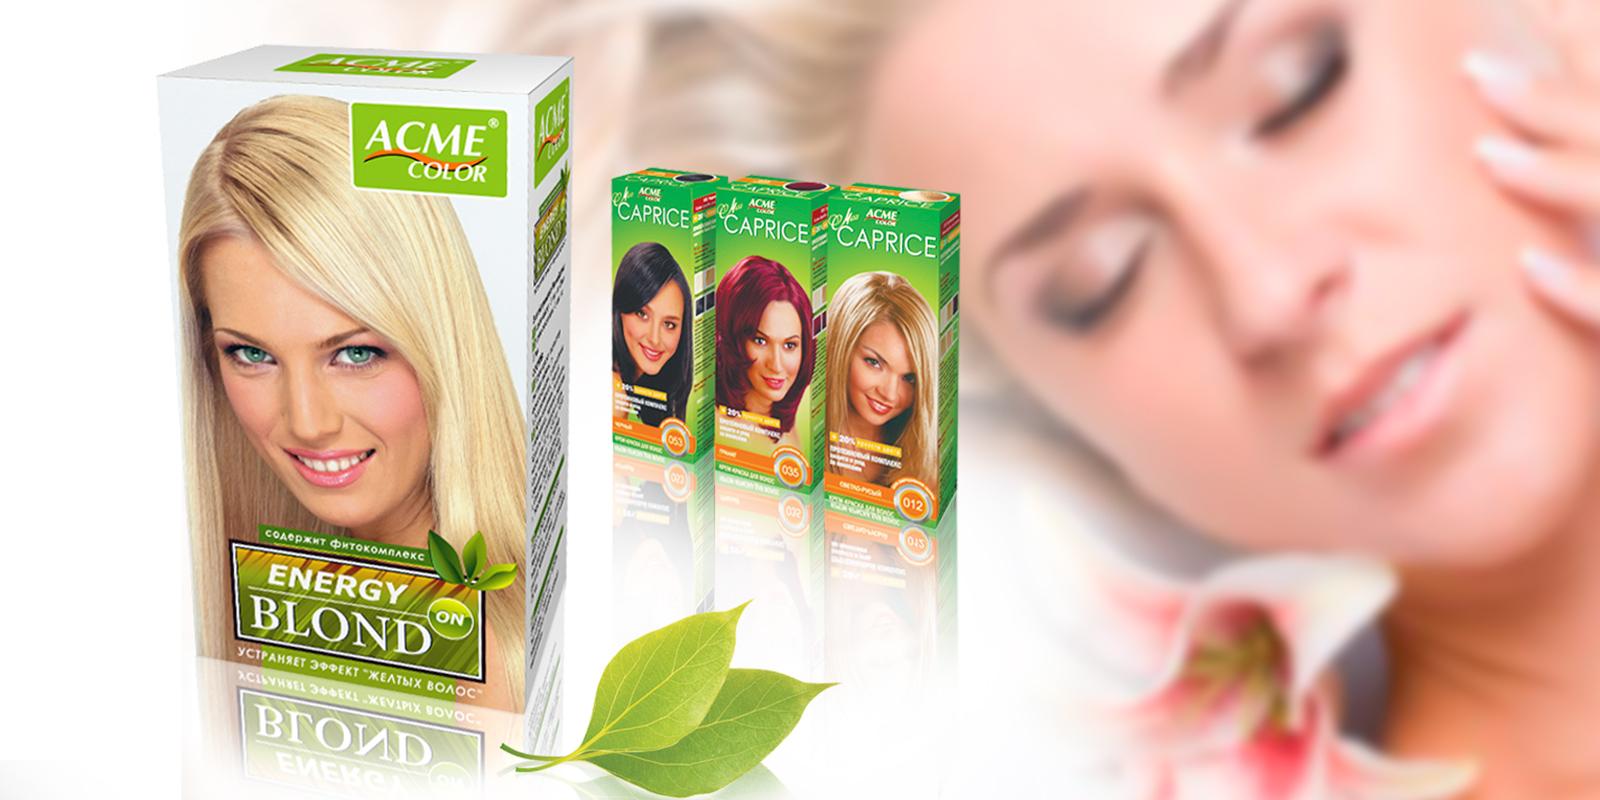 TM Аcme;;;;;;Разработка упаковки (краска для волос);;;;;;<span>Клиент:</span> TM Аcme;;;;;;;;;;;;Разработка упаковки (краска для волос);;;;;;2